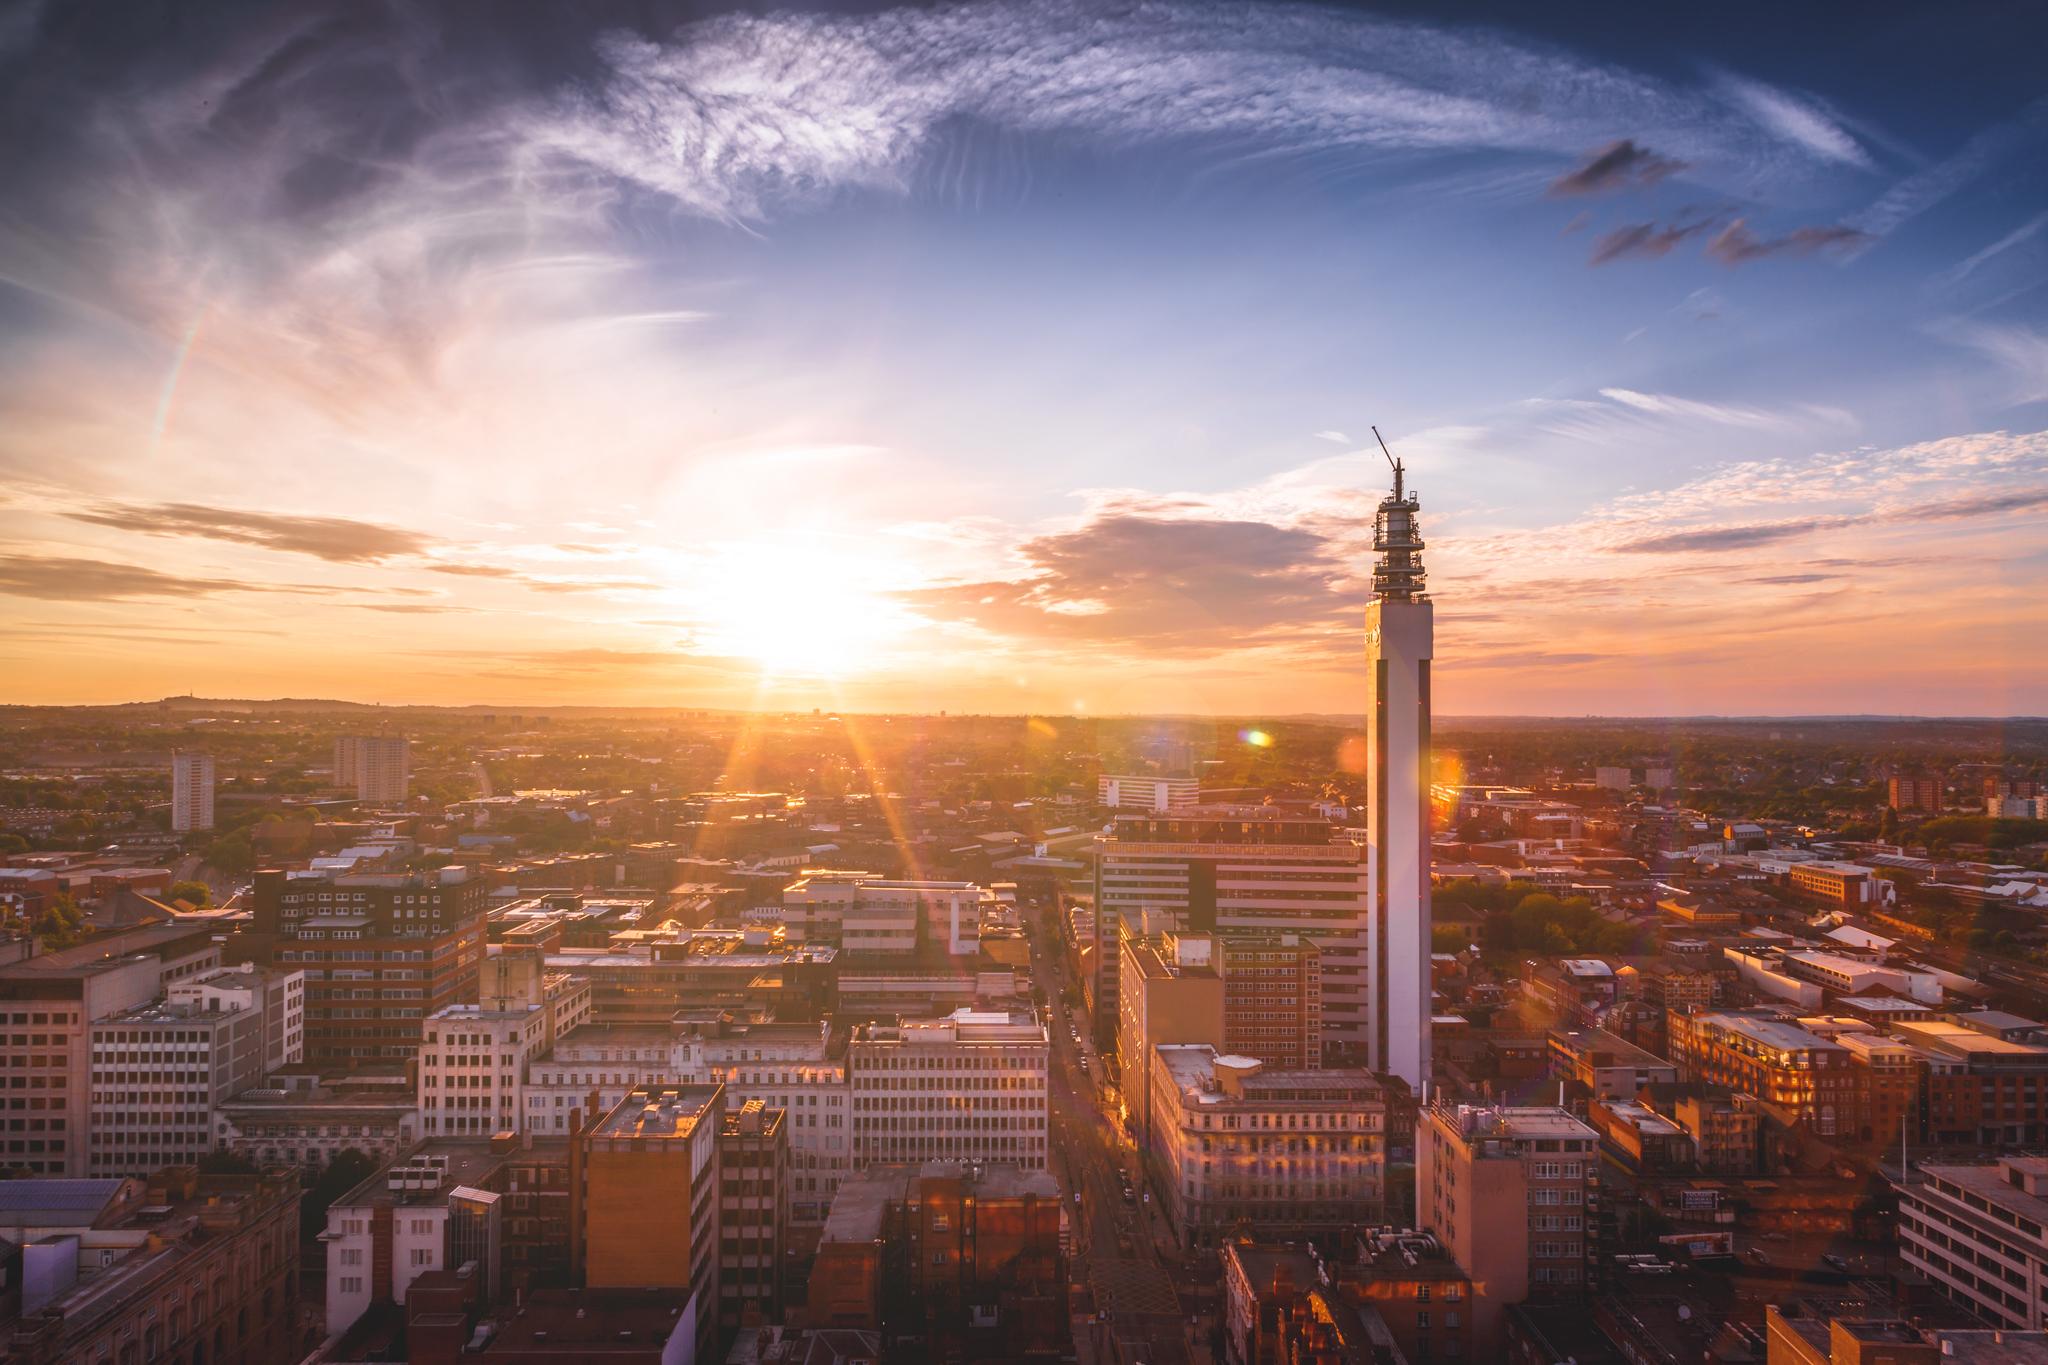 Sun sets on Birmingham